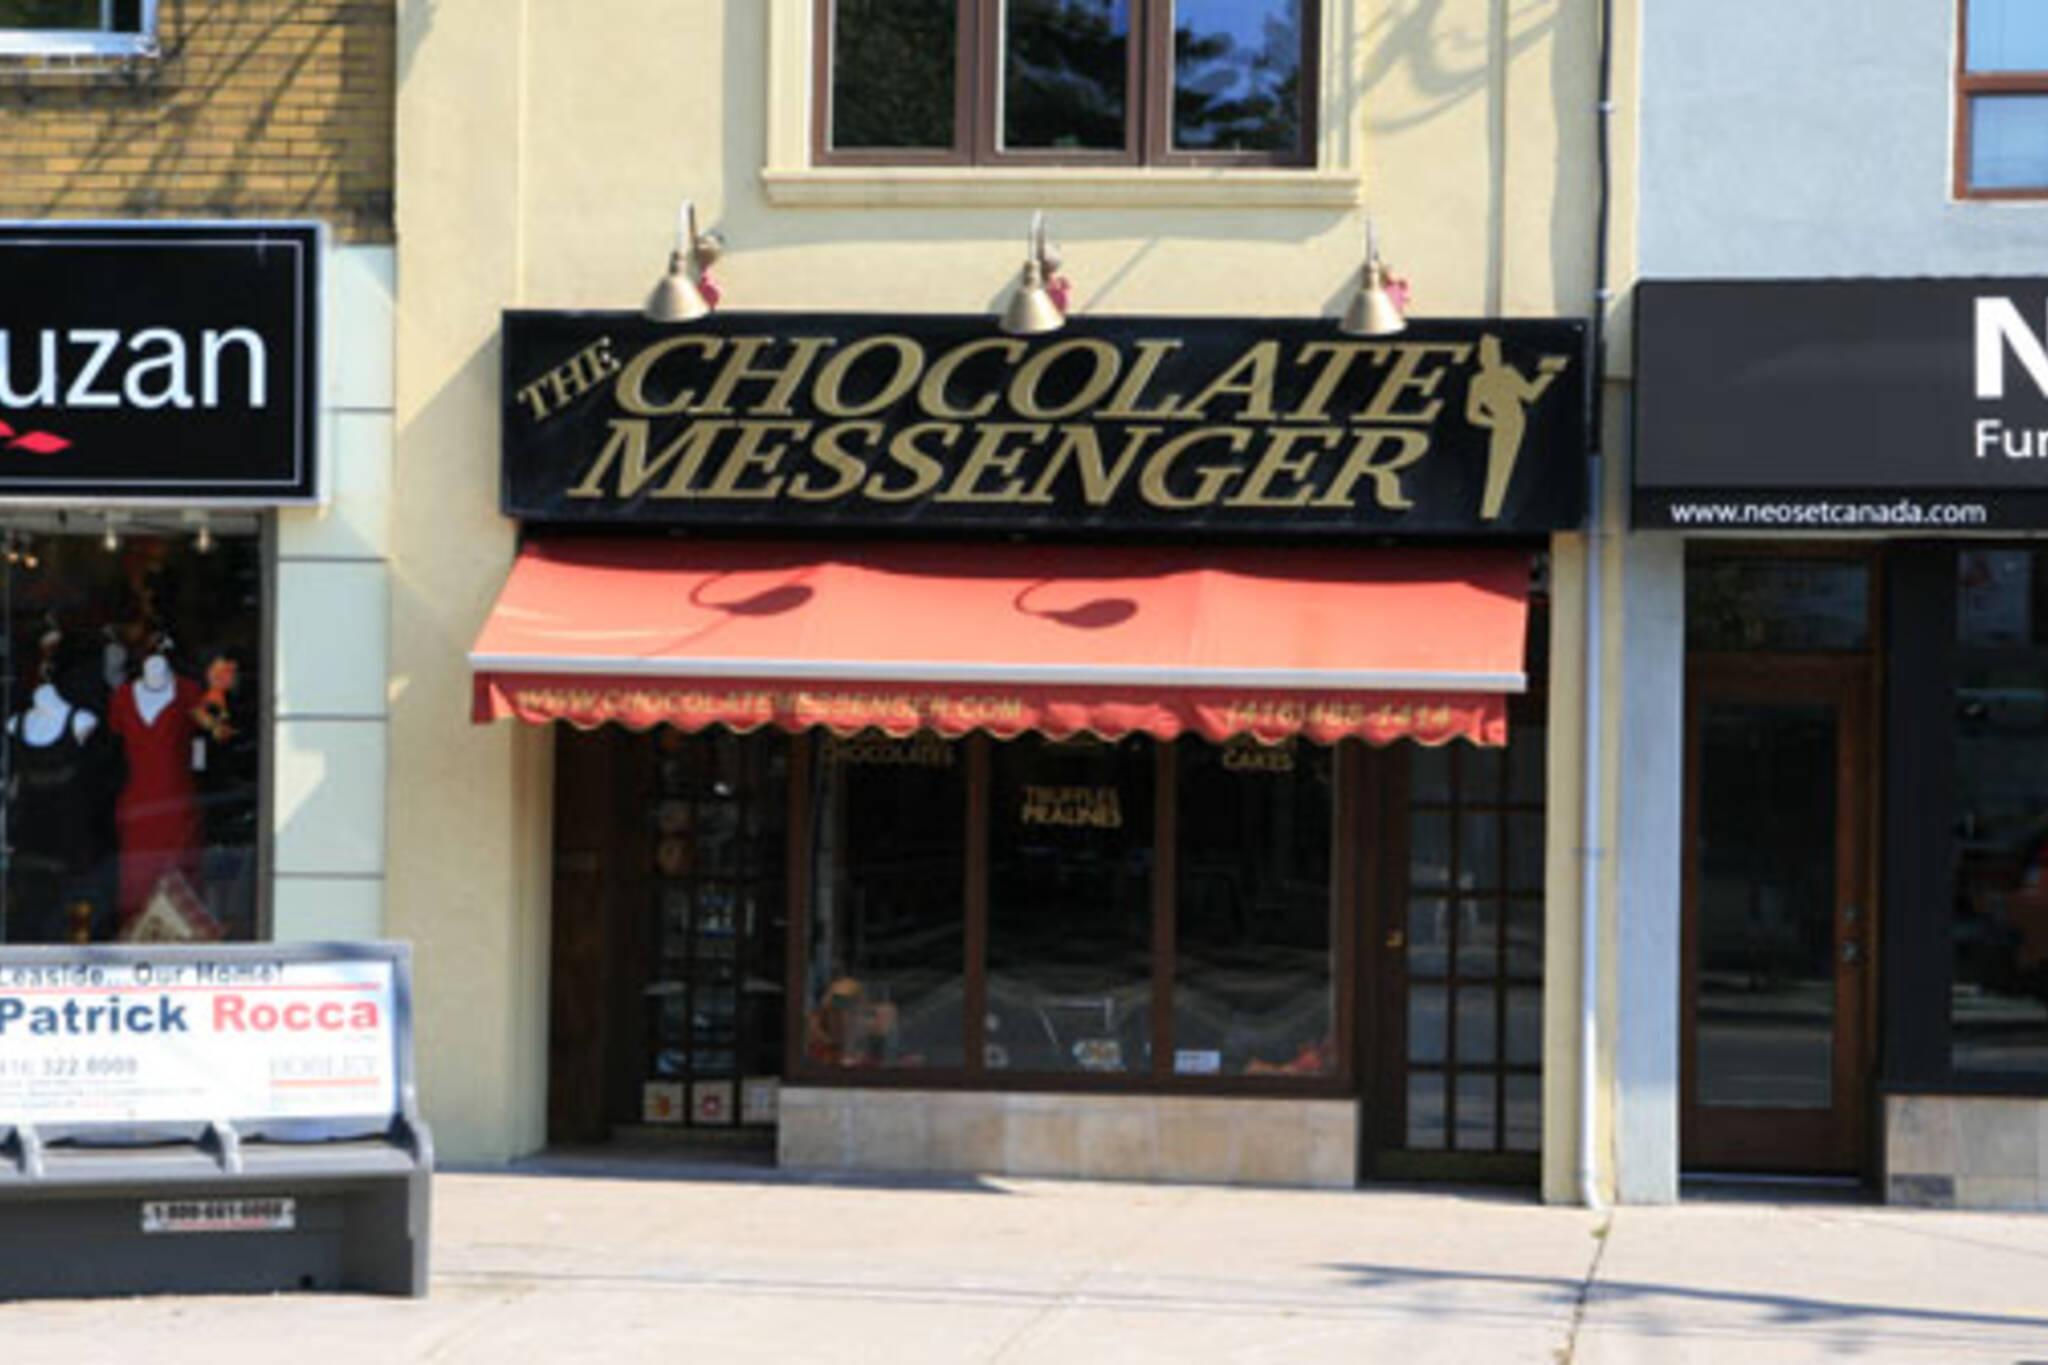 Chocolate Messenger